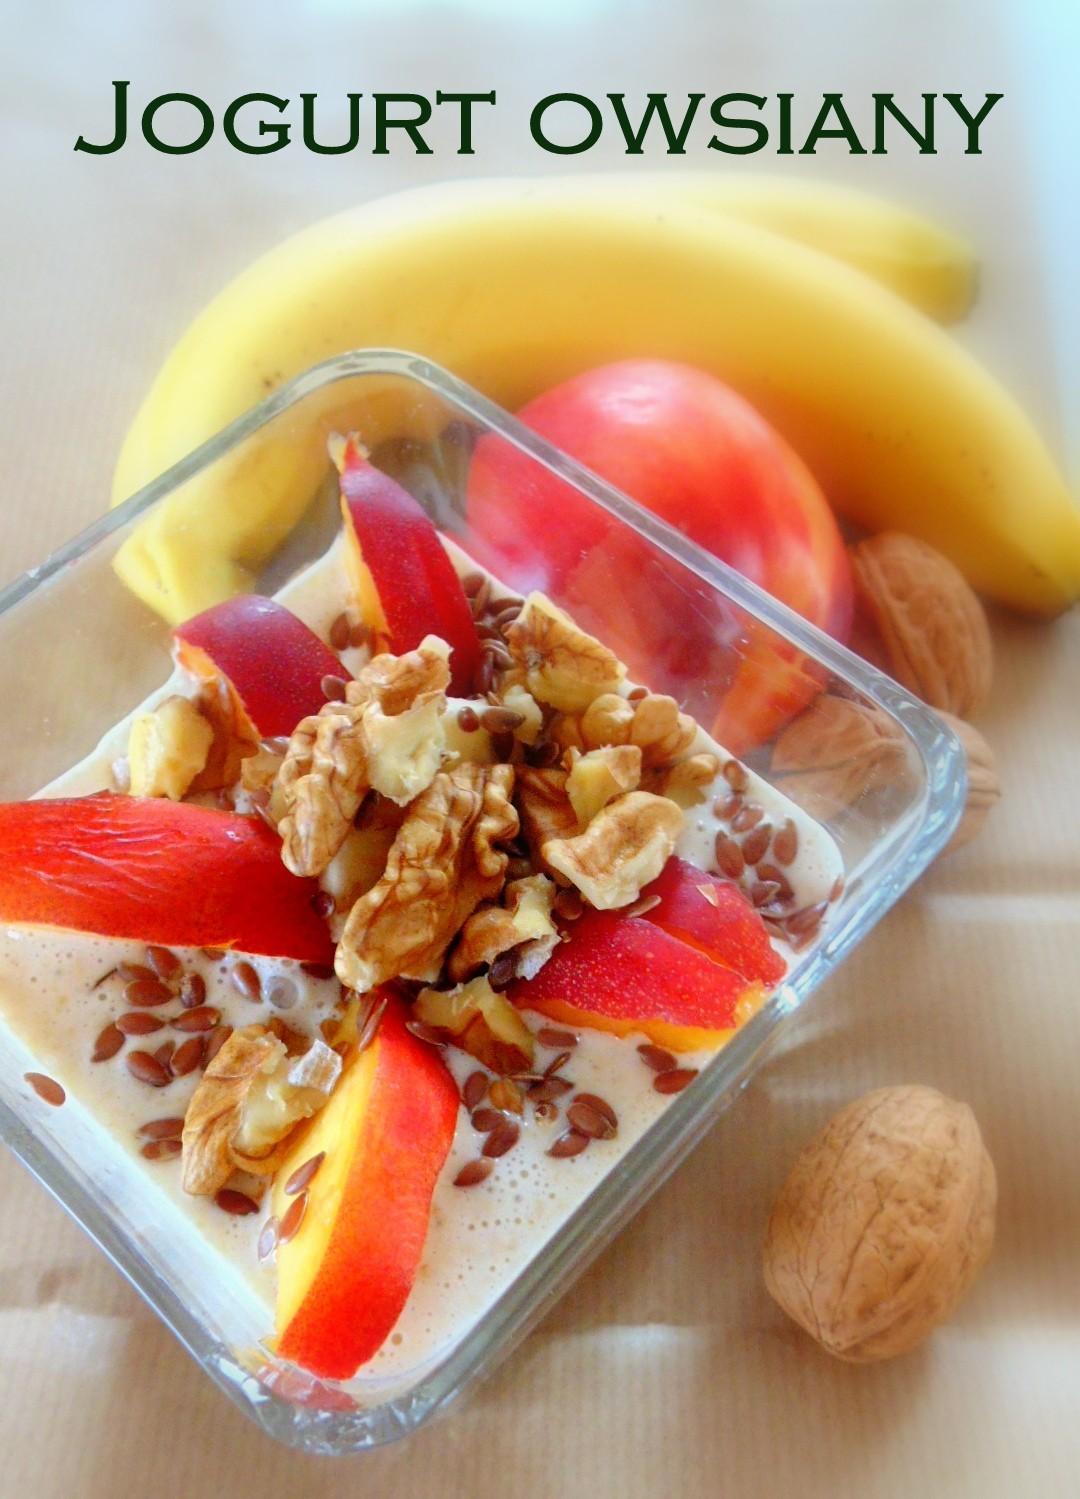 jogurt owsiany